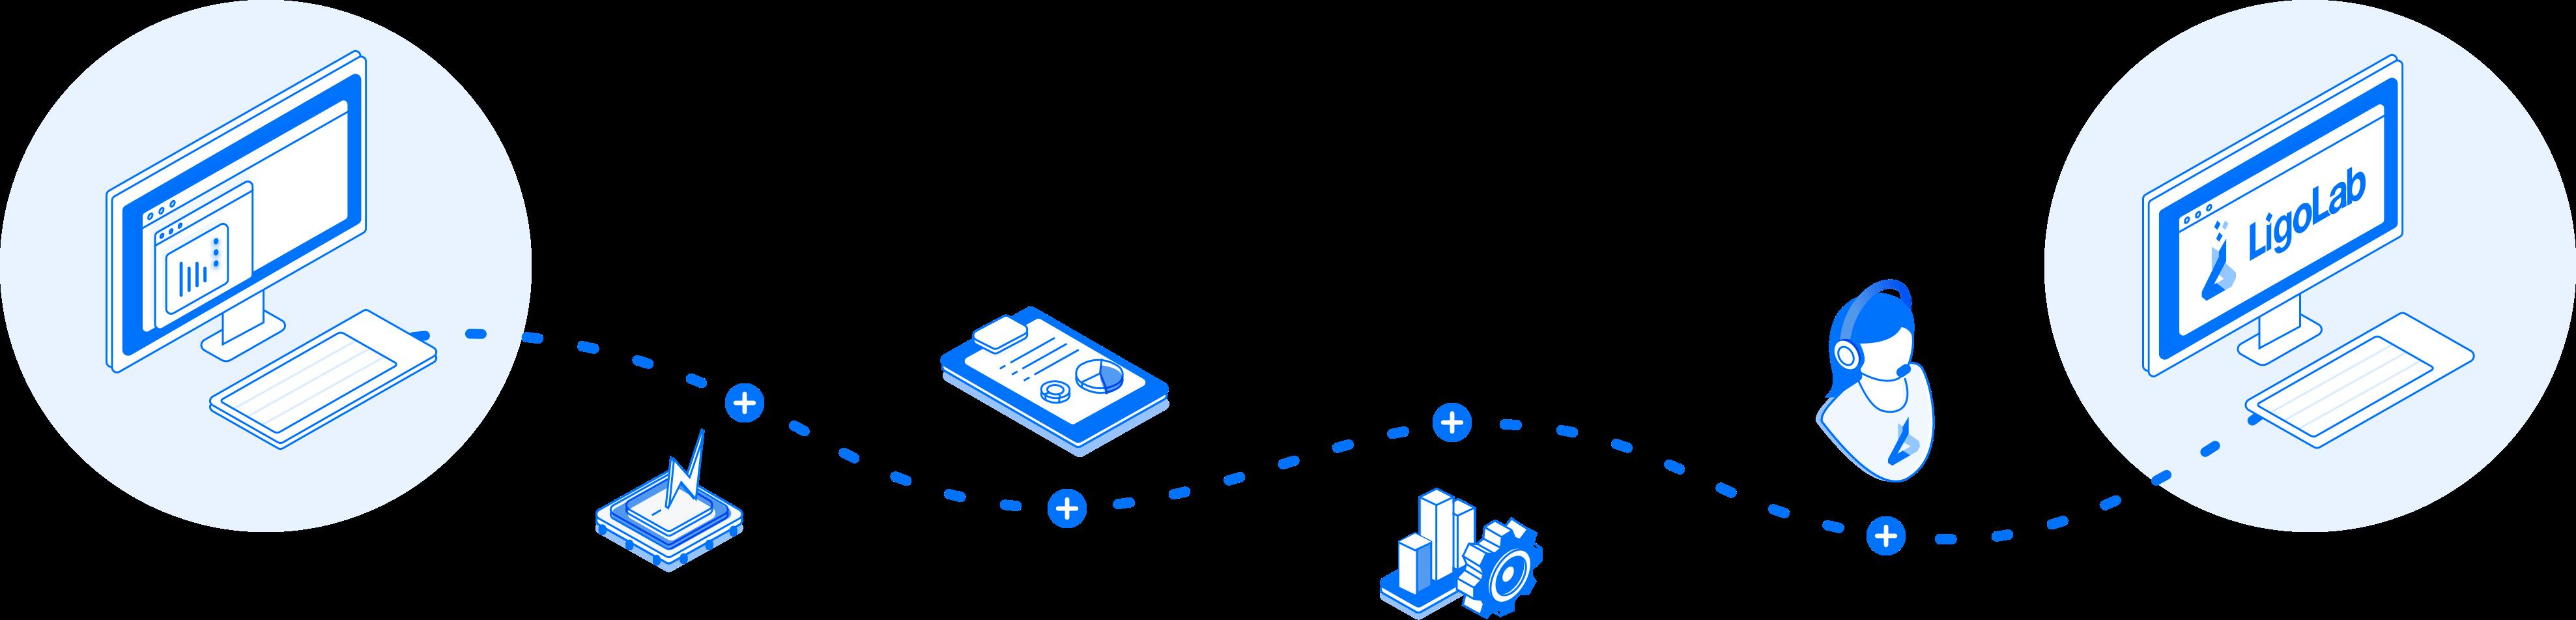 laboratory information system process flow